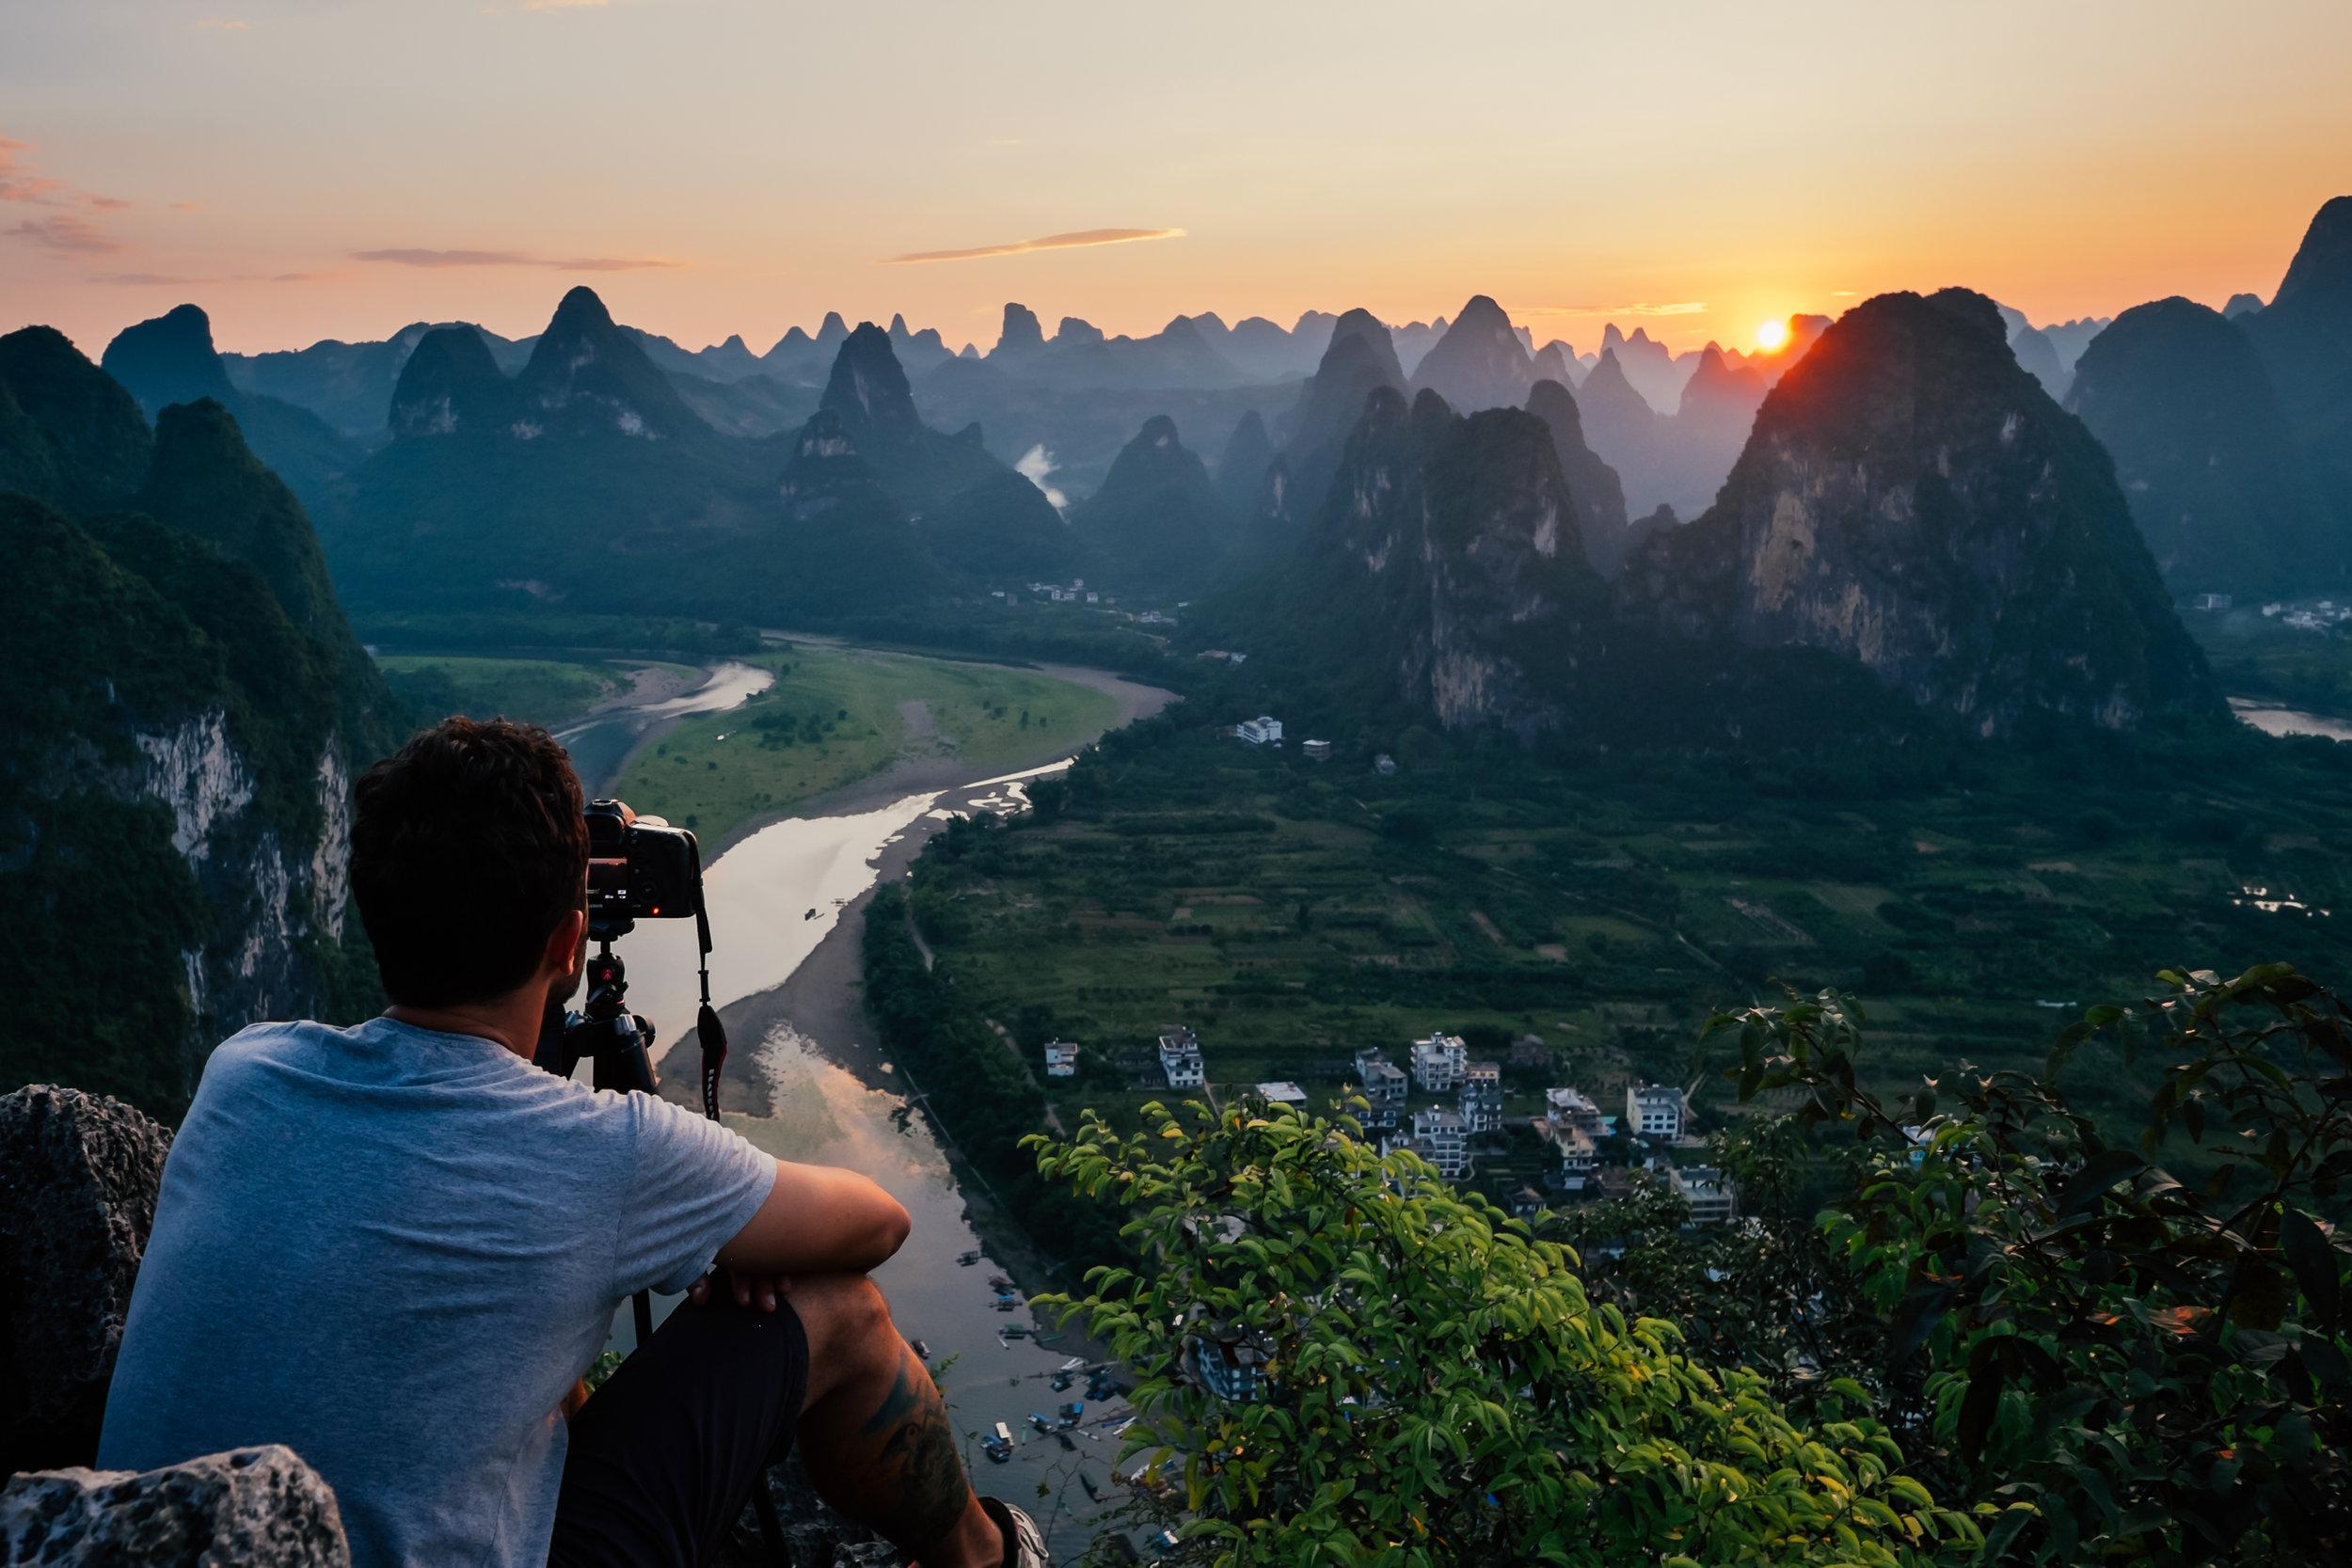 Sunset over the Li river, China